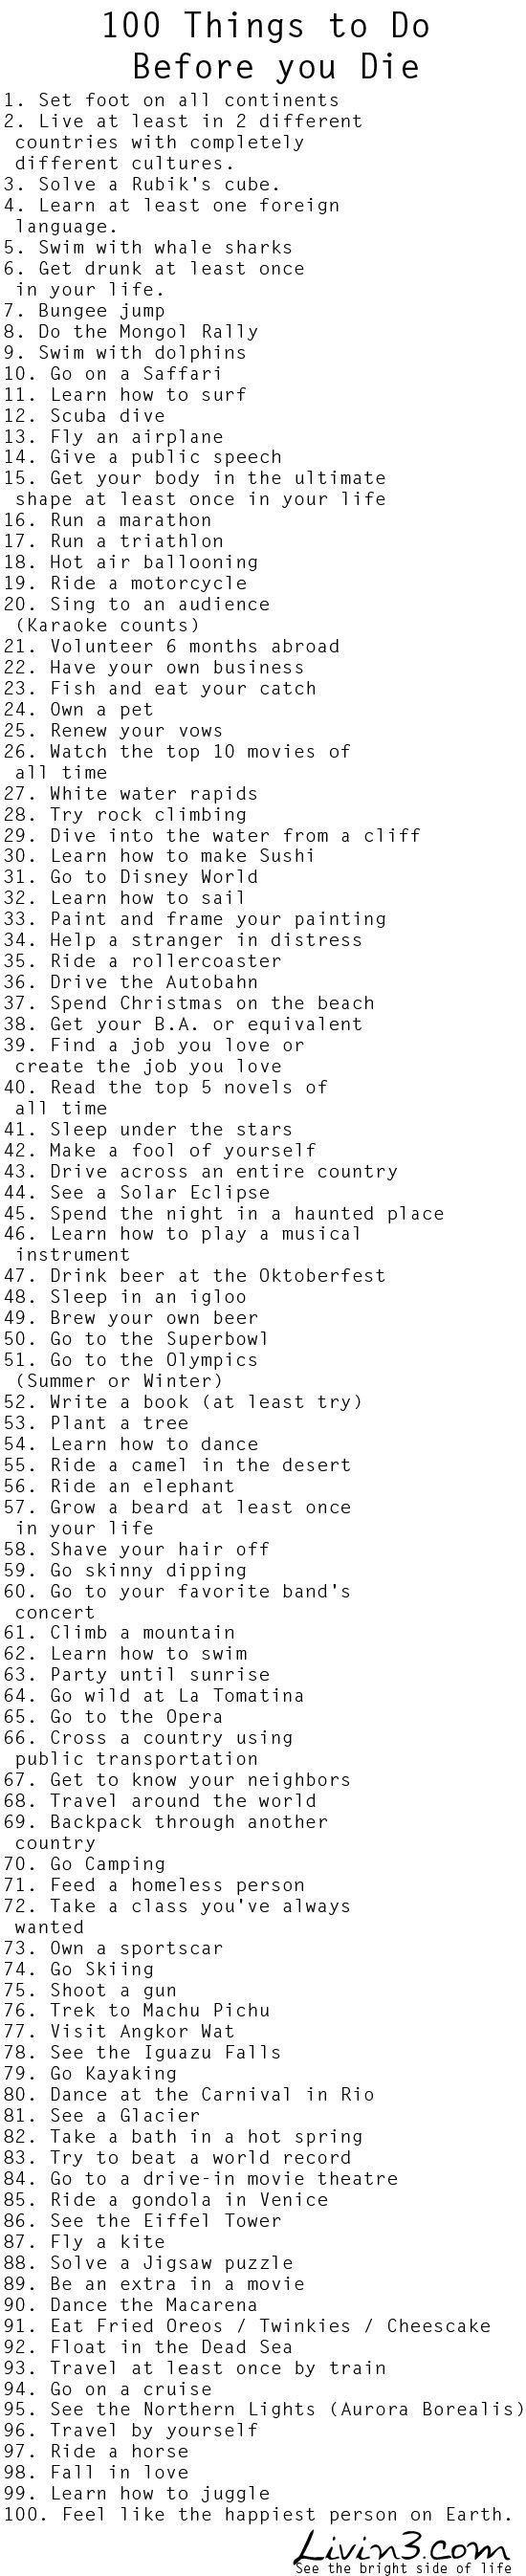 10 Spectacular Bucket List Ideas Before You Die 100 things to do before i die bucket list live your life ya know 2021